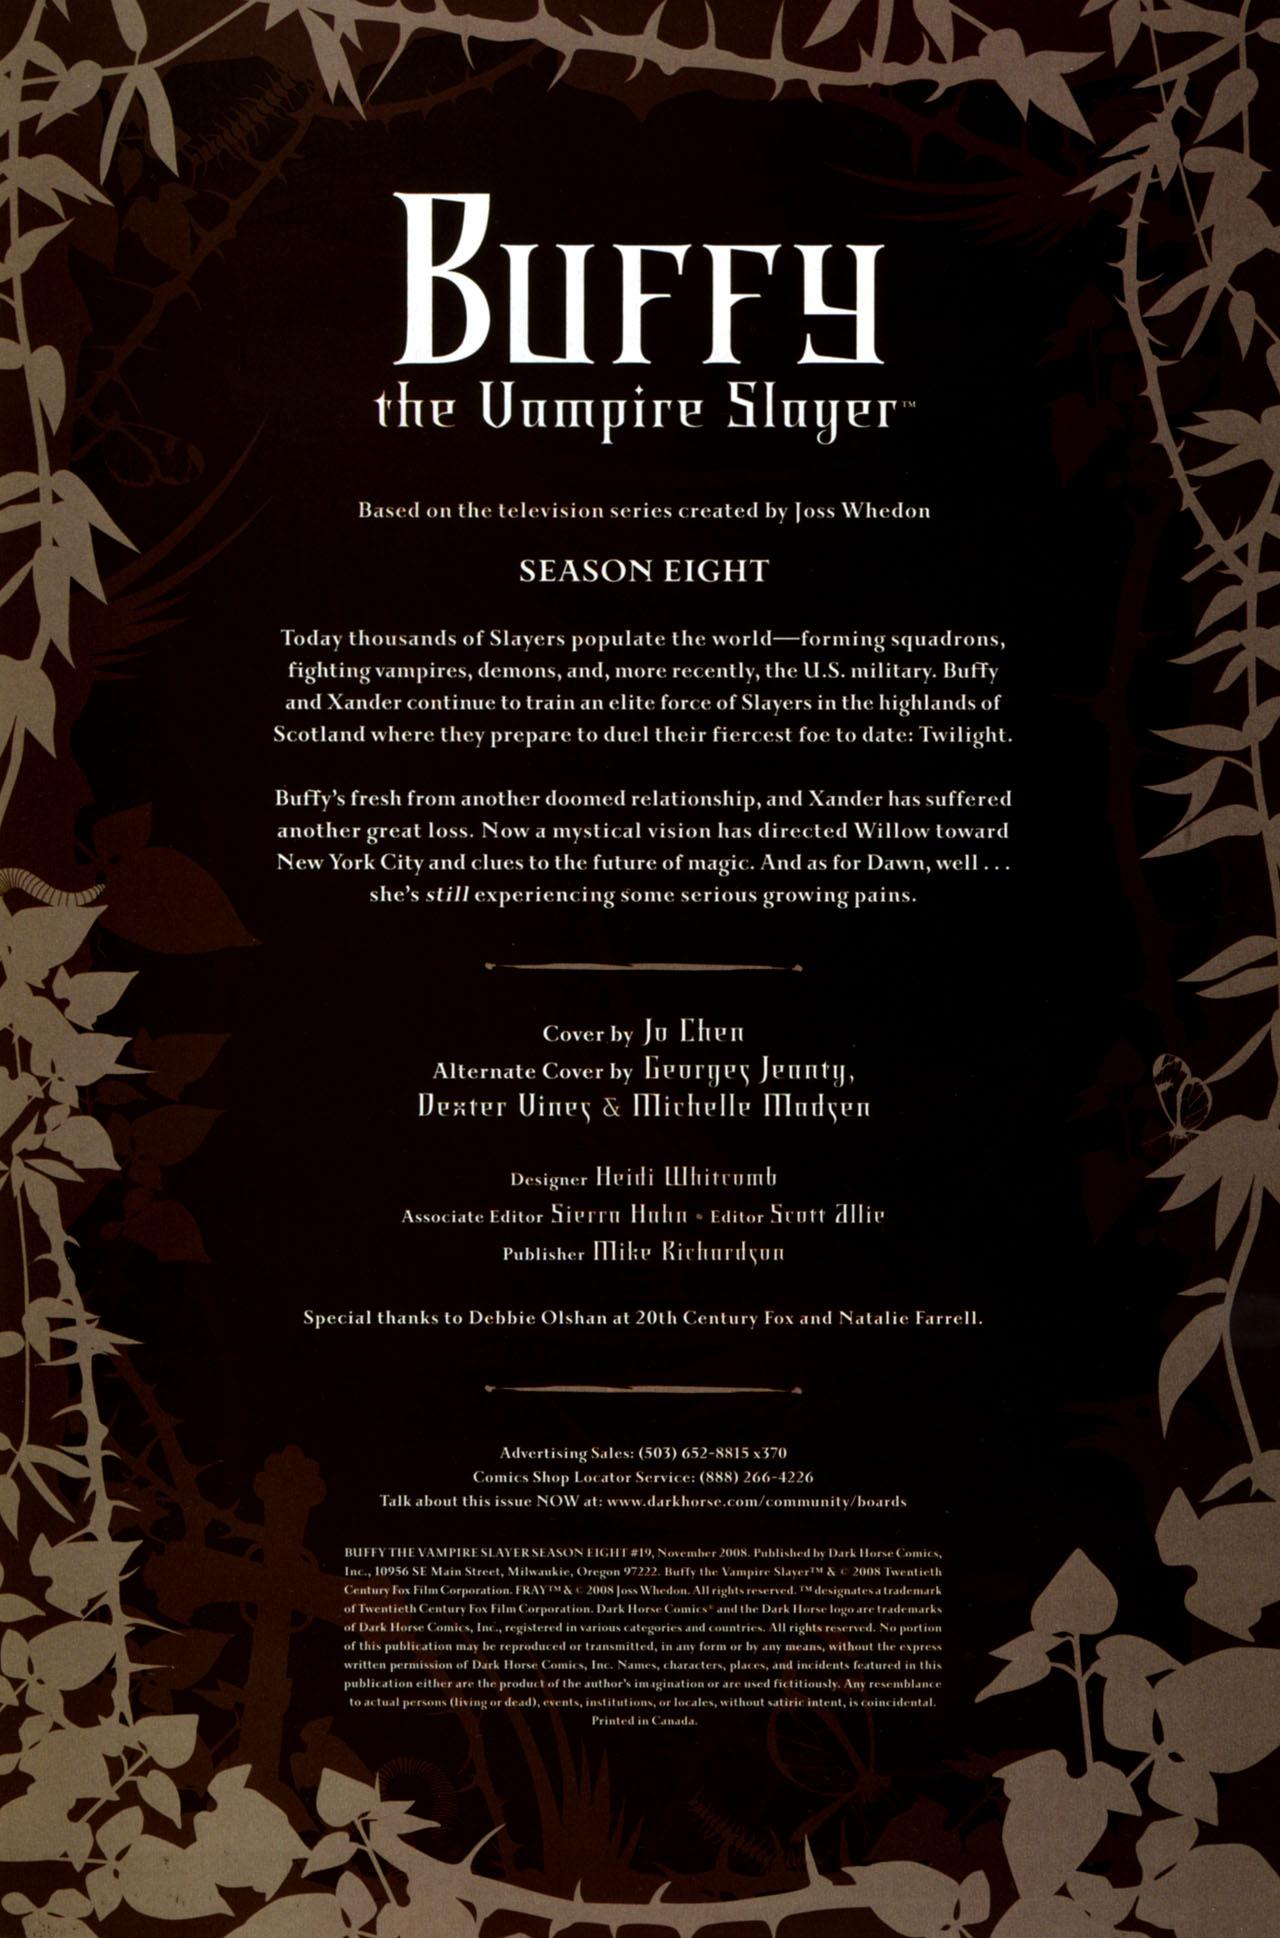 Buffy the Vampire Slayer Season Eight 19 Page 3